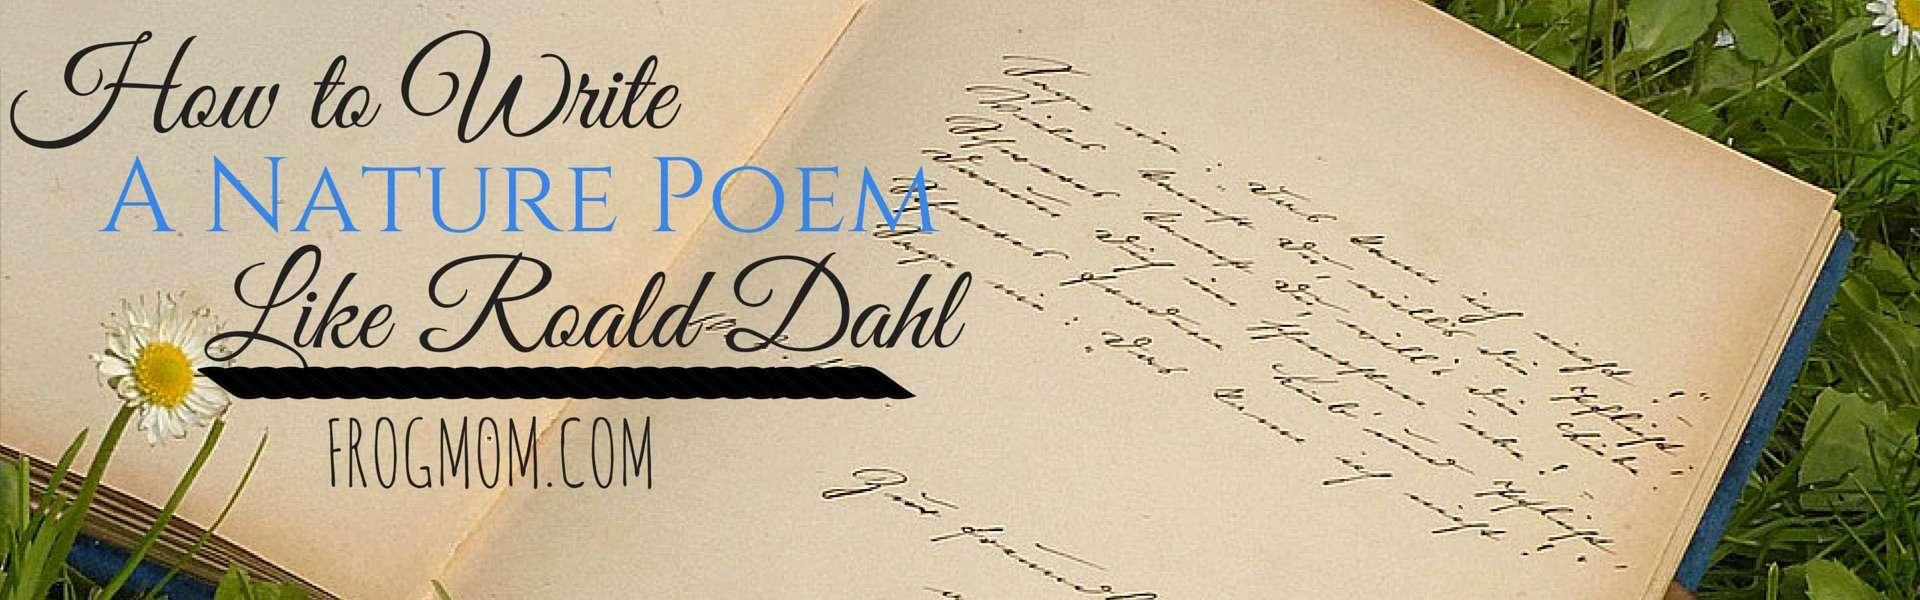 Roald dahl essay